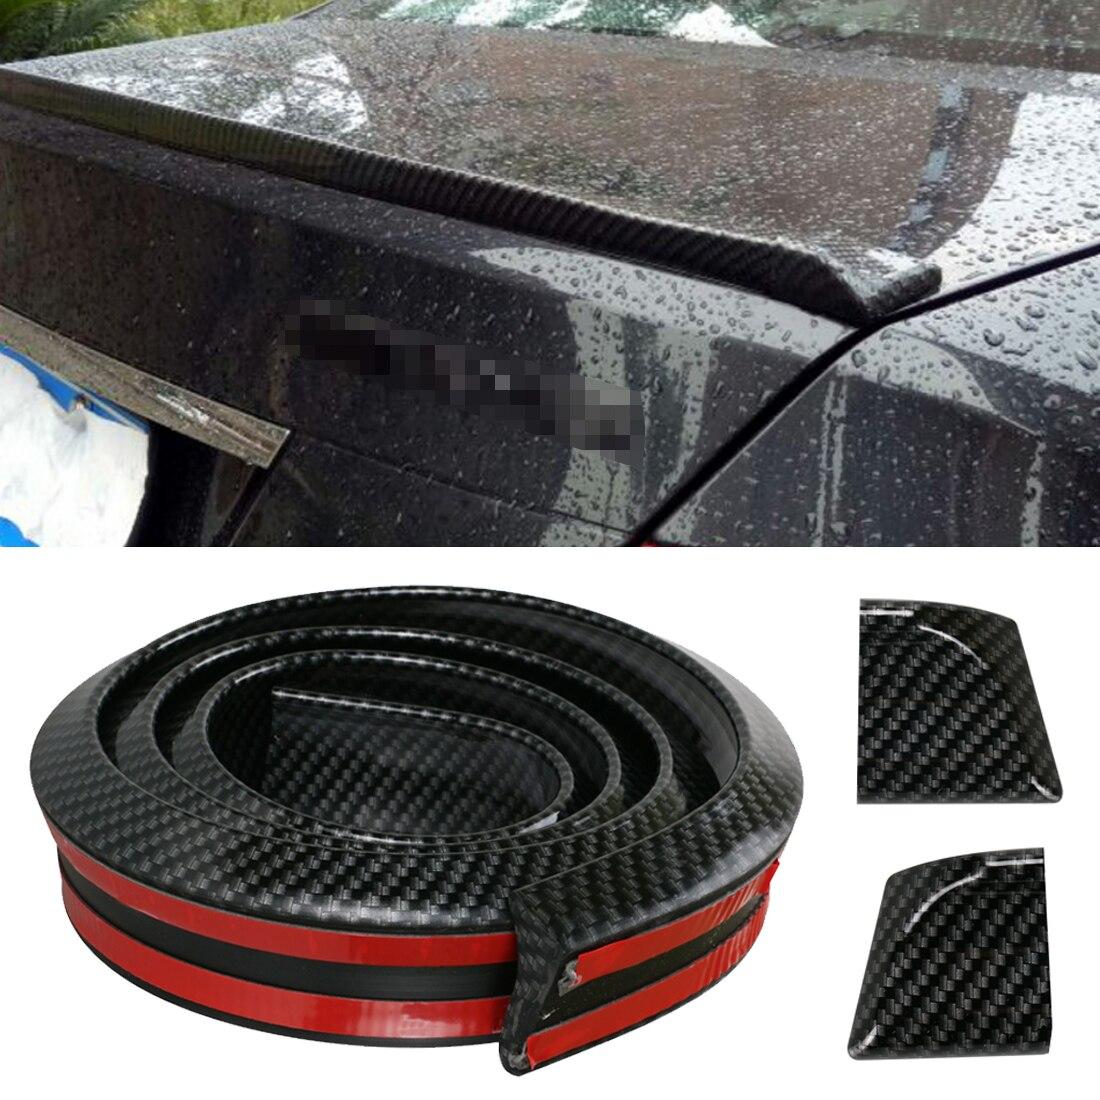 1 5M Universal Car Spoiler Carbon Fiber Rear Spoilers Roof Wings Trunk Sticker Kit Tail Rubber